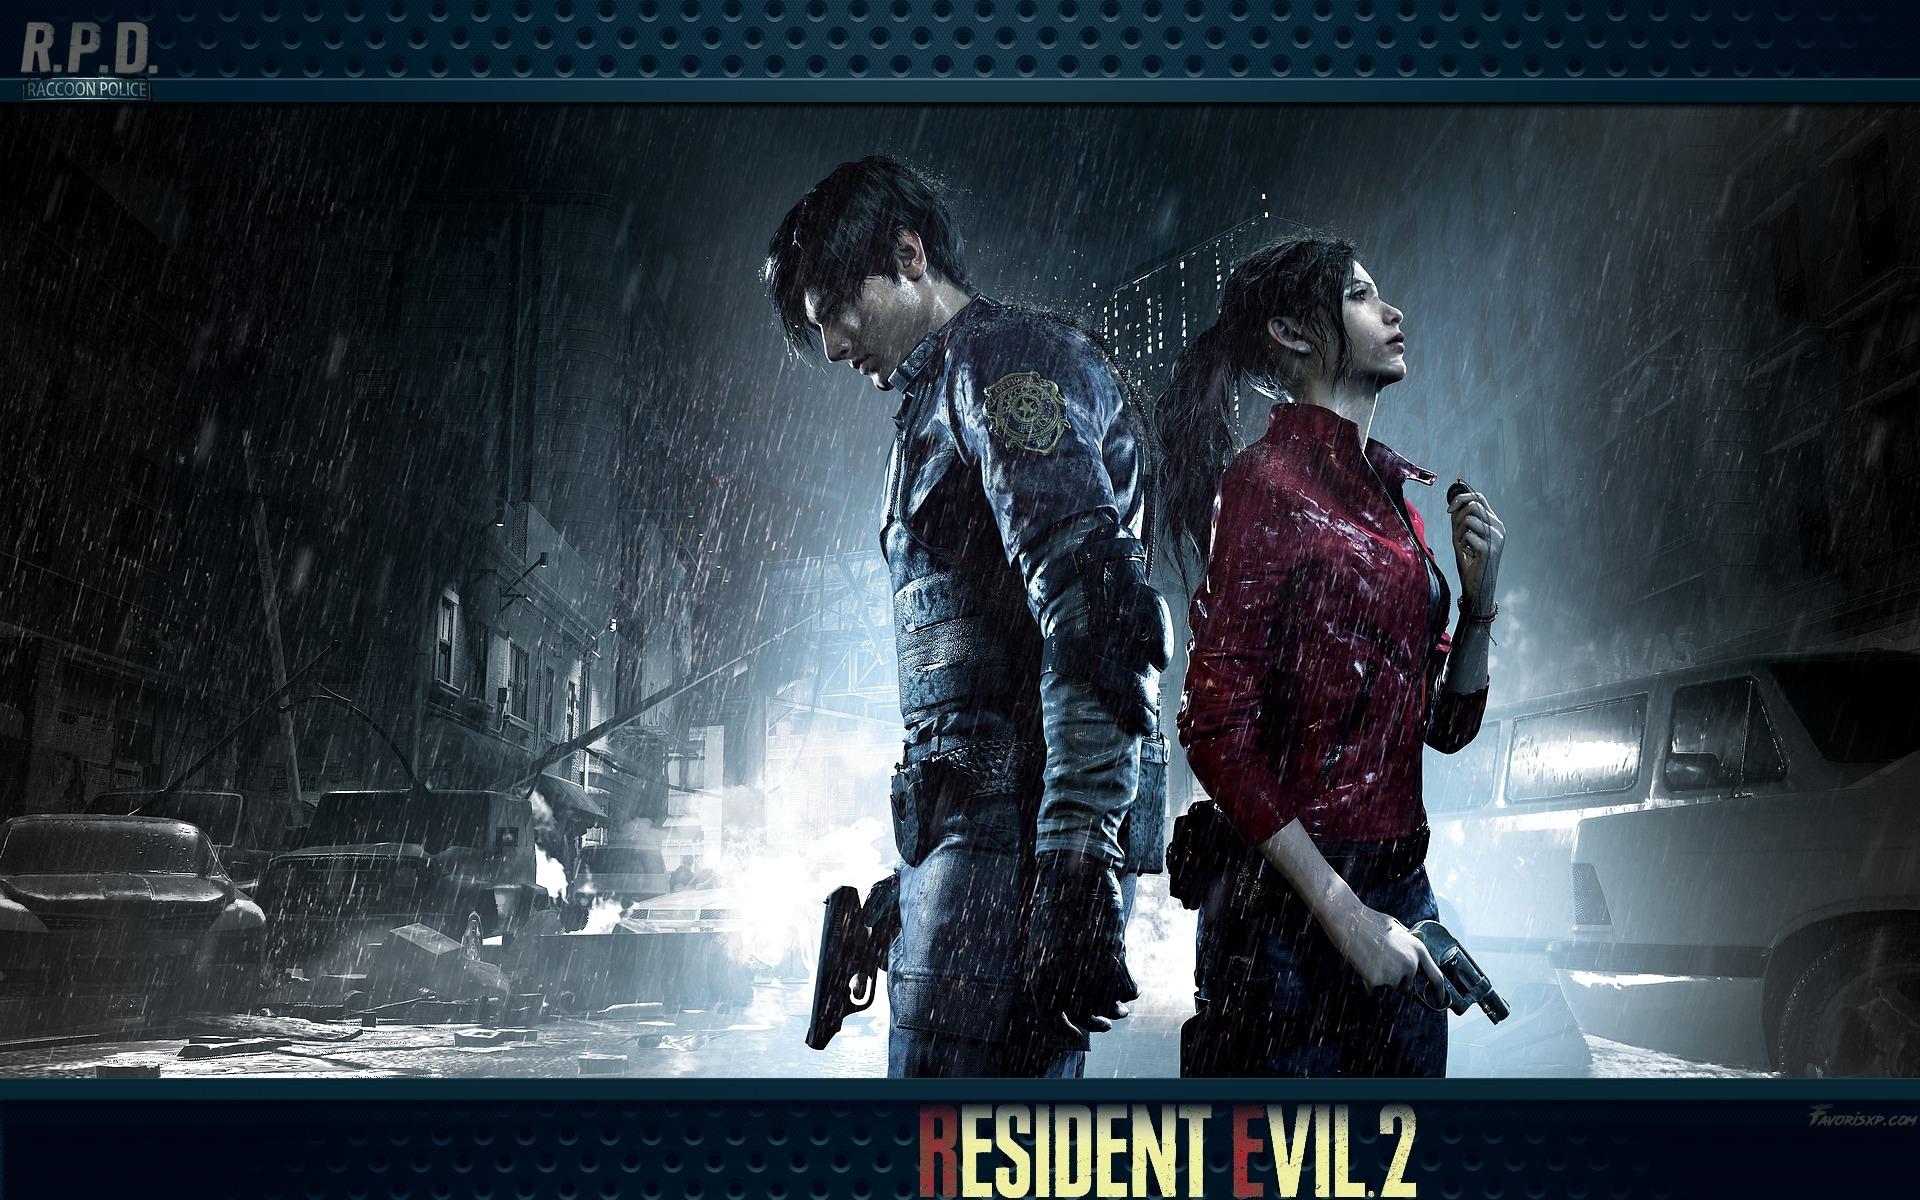 Resident Evil 2 Remake Fonds D Ecran Image Arriere Plan Wallpaper Favorisxp